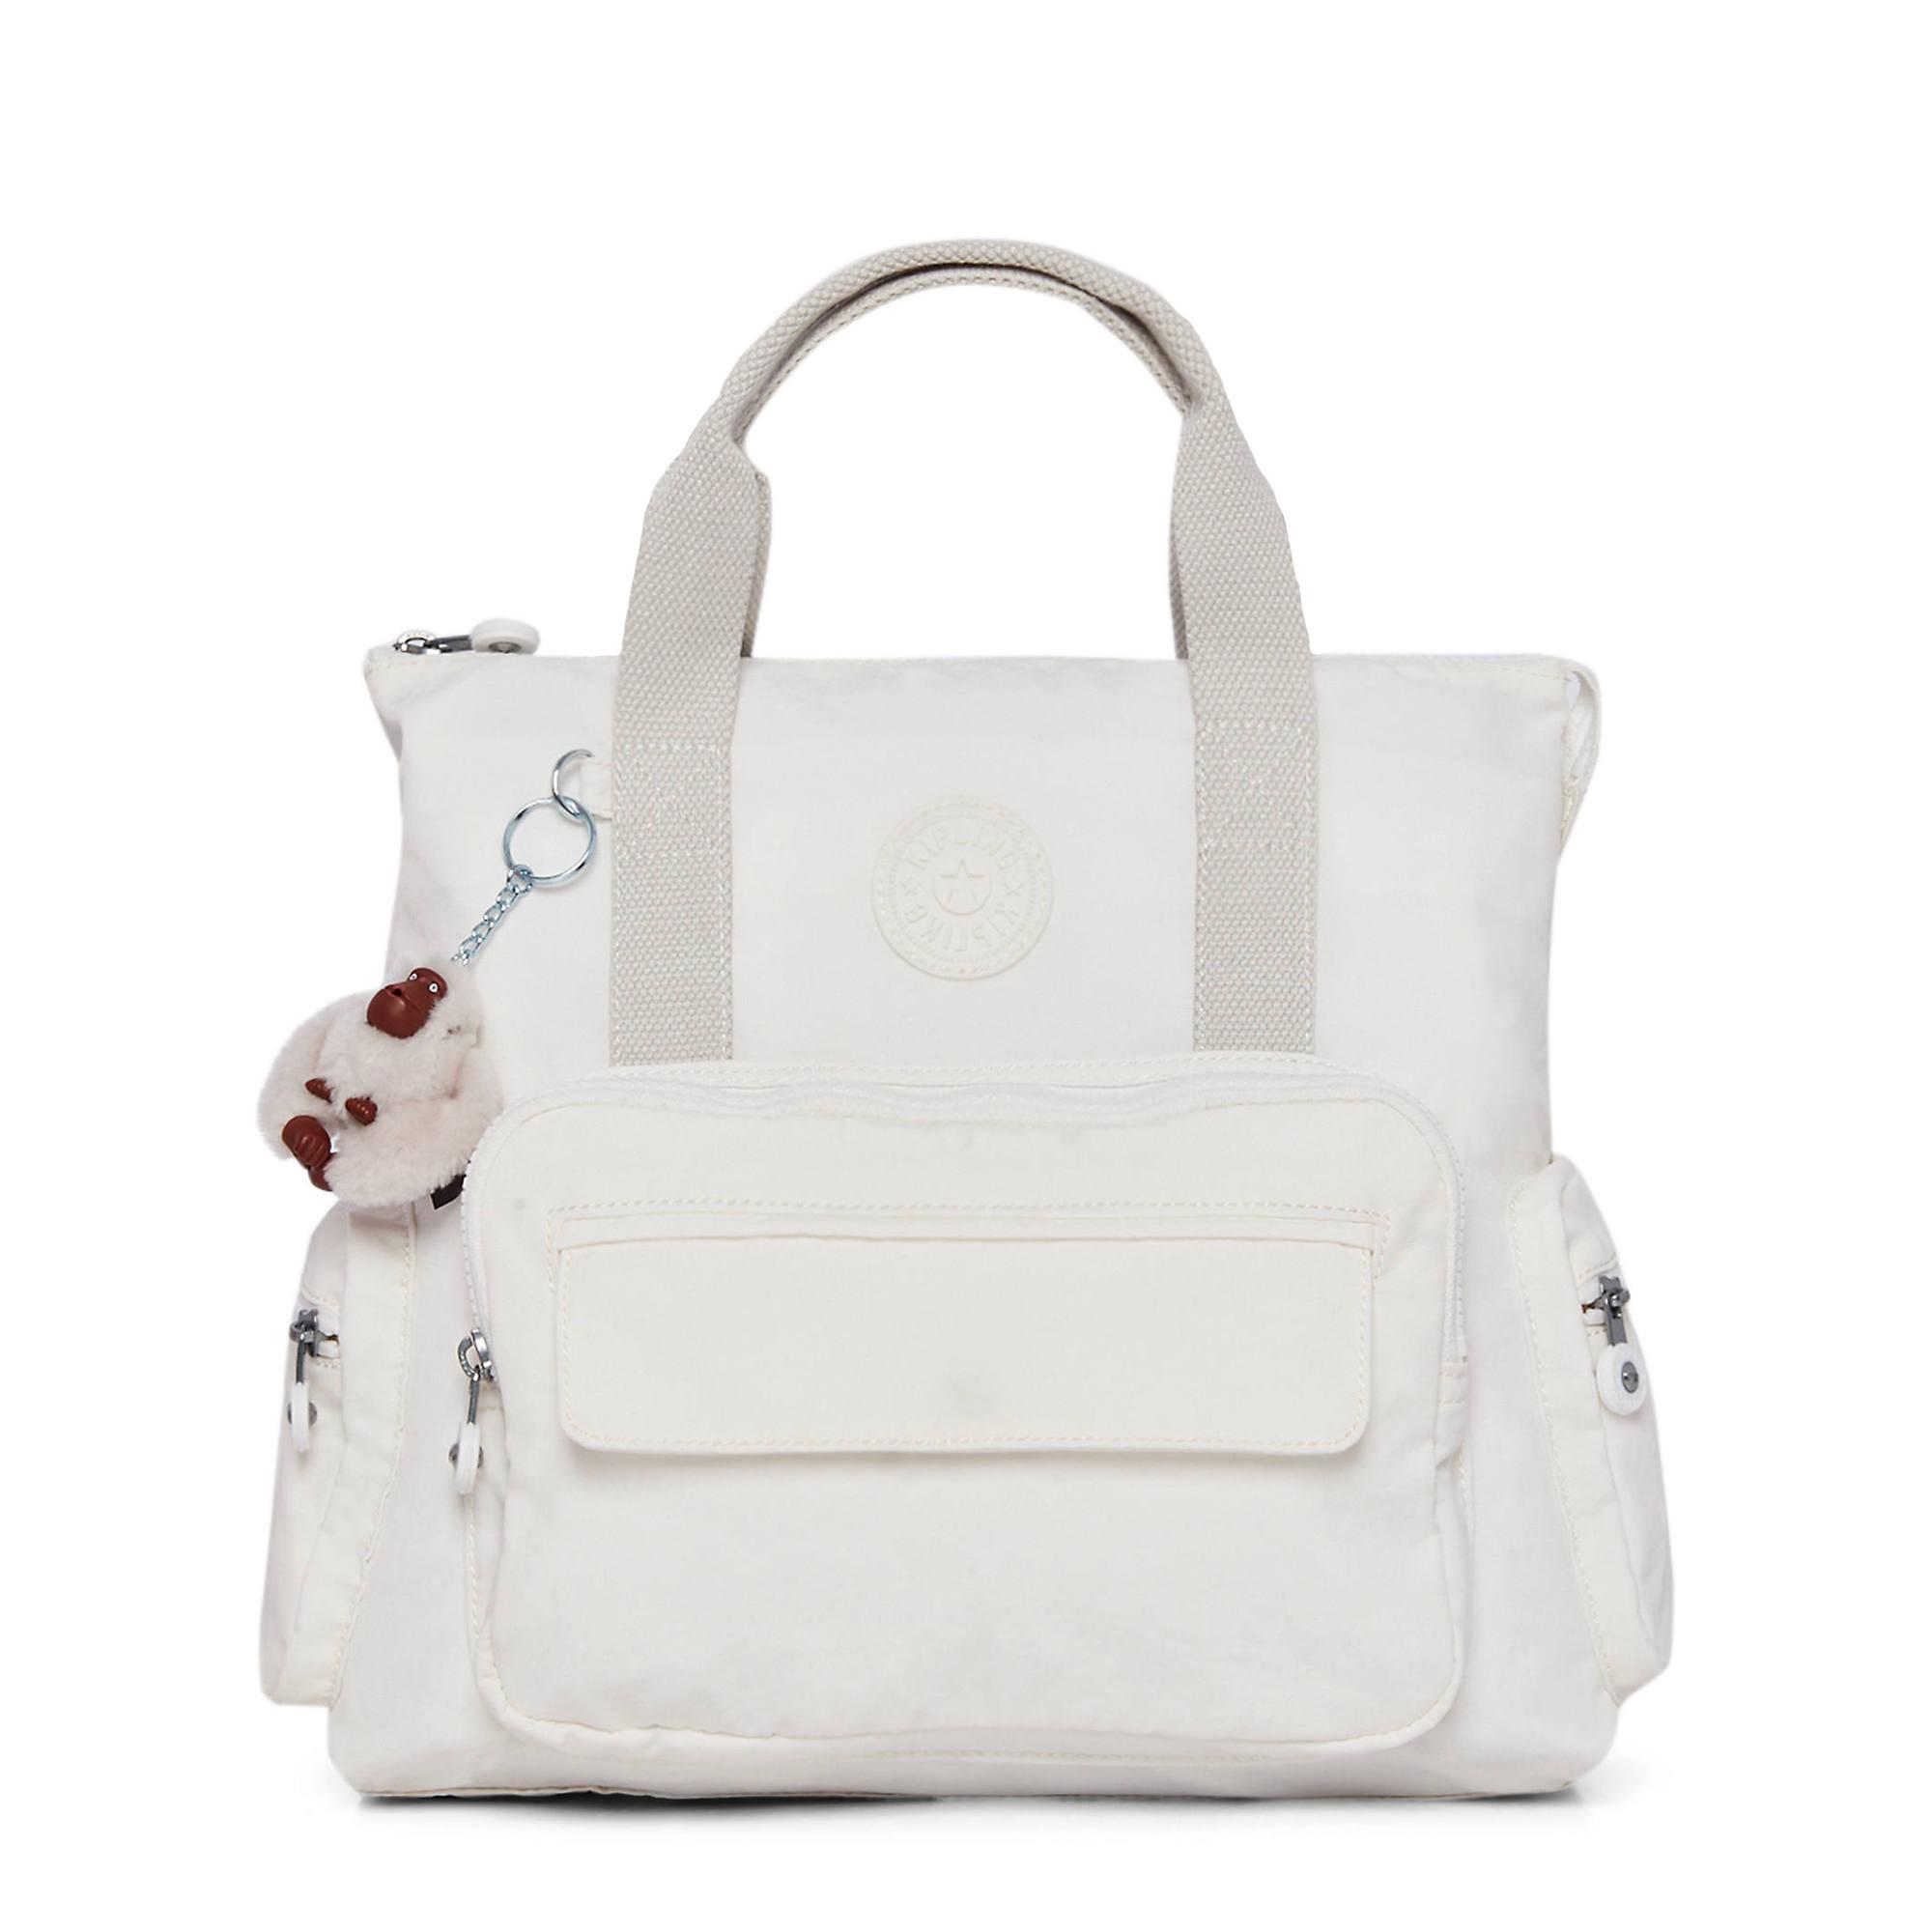 Kipling-Alvy-2-In-1-Convertible-Tote-Bag-Backpack miniatura 4